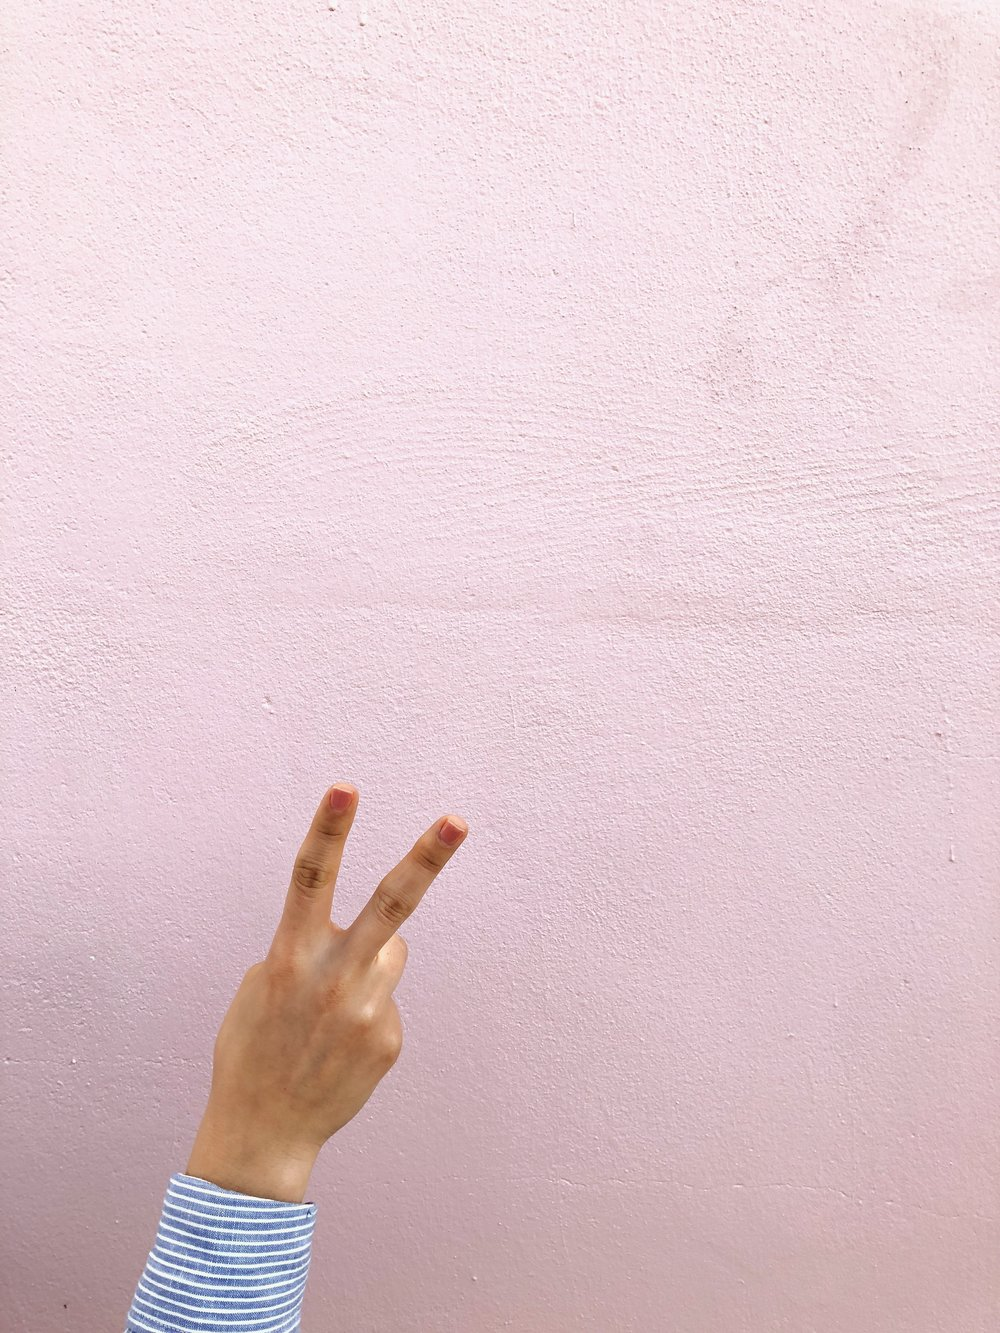 Photo By Kira Semple | KiraSemple.com